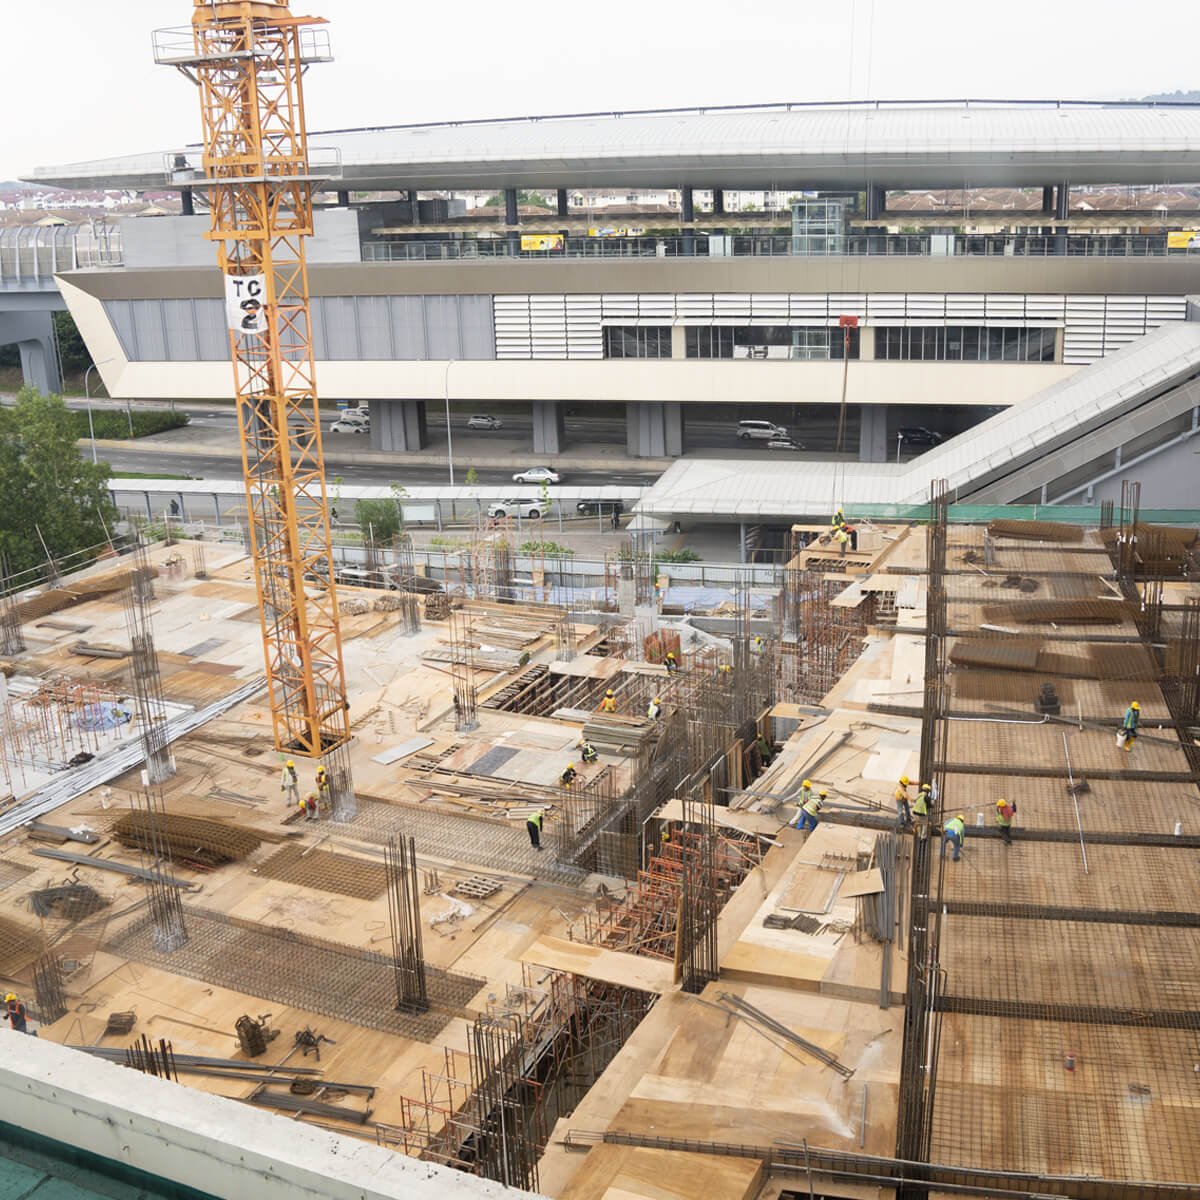 THKD Thomson Hospital Expansion